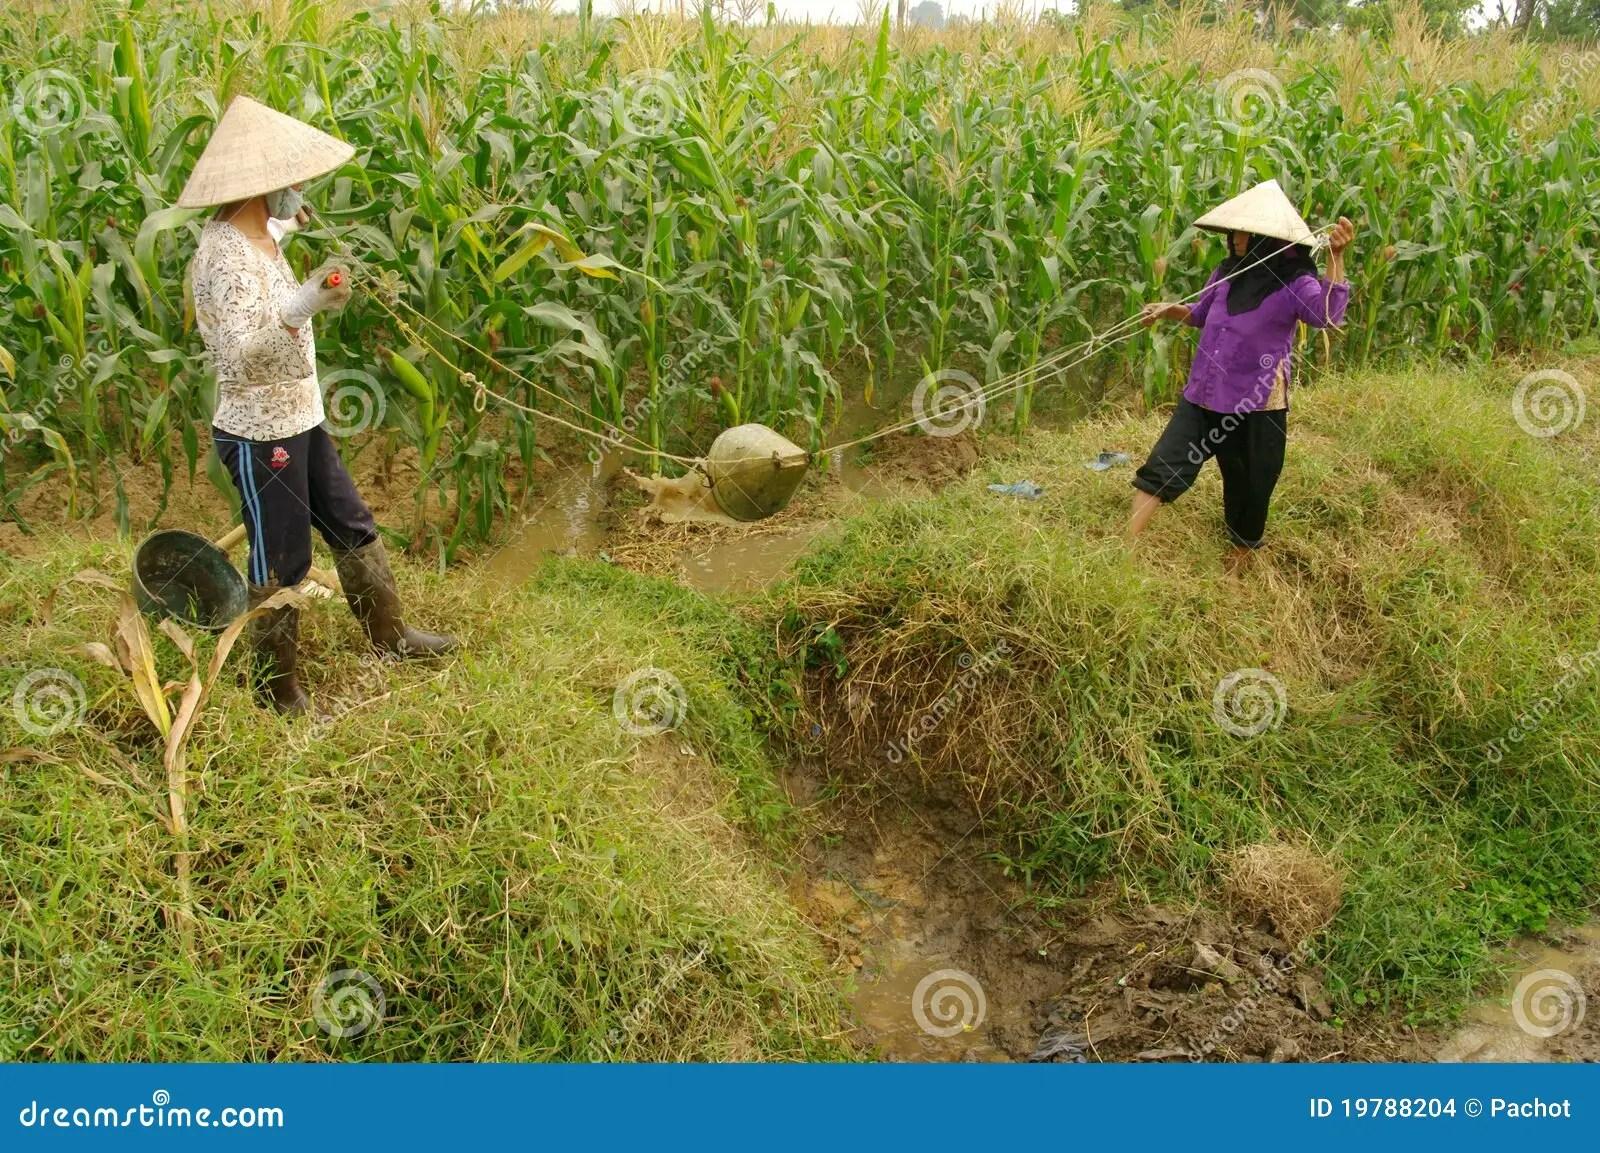 Women Performing Manual Irrigation Editorial Stock Image - Image: 19788204